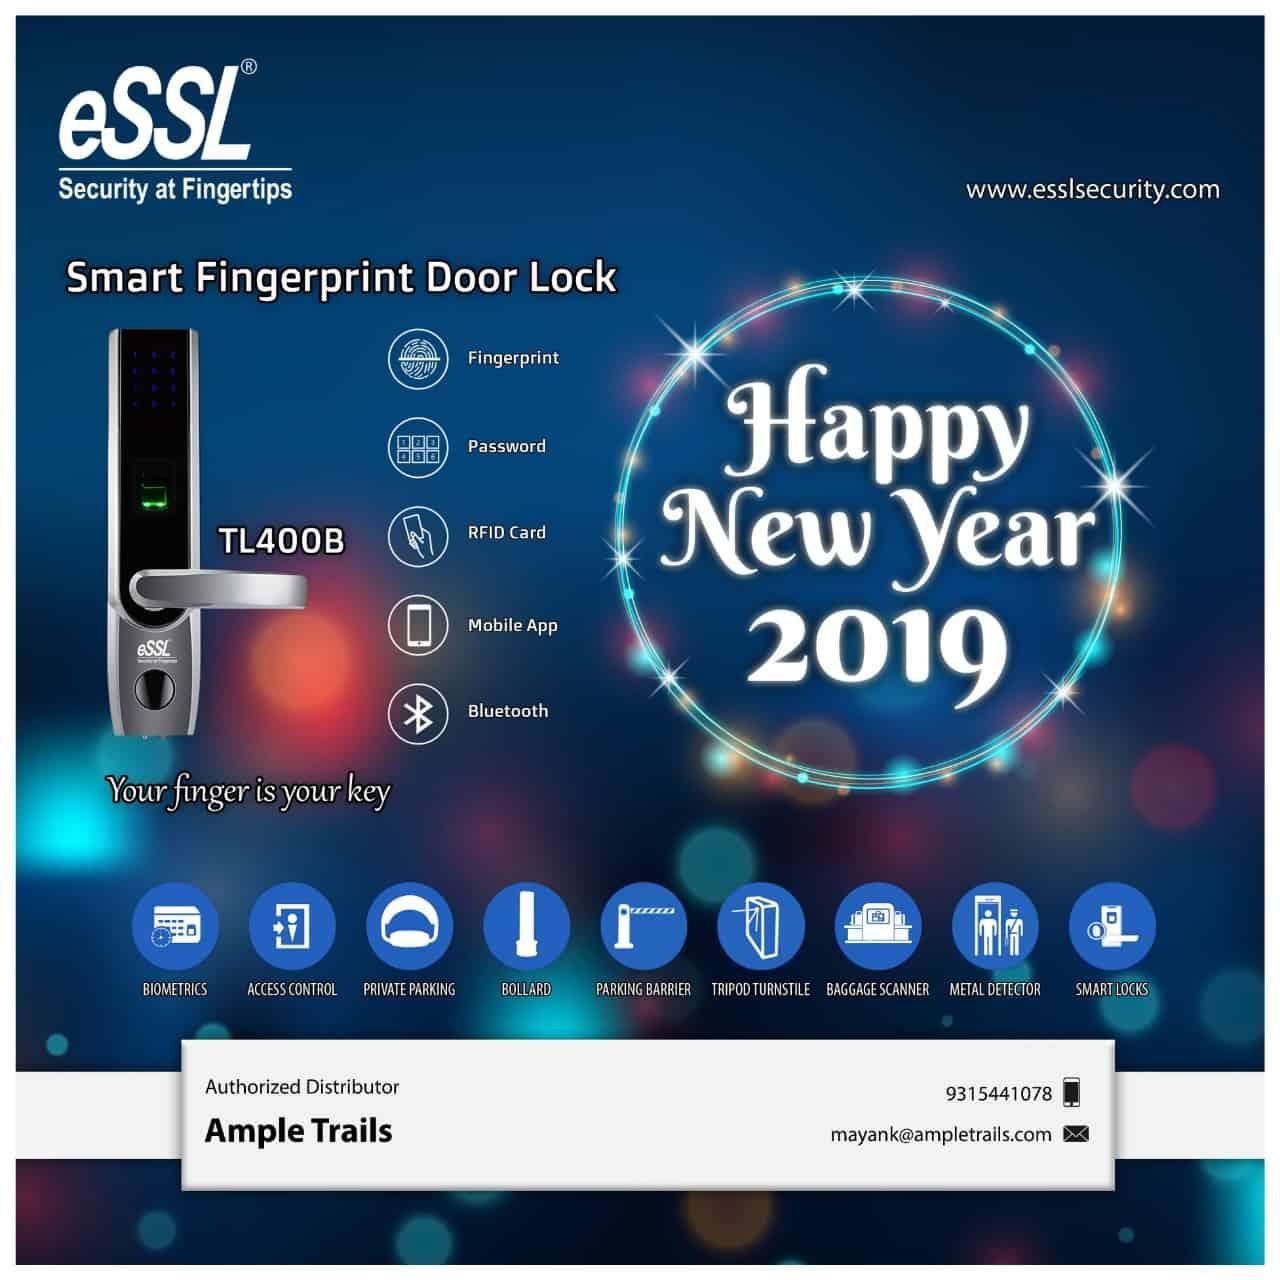 eSSL Fingerprint Digital Door Lock in Gurgaon, डिजिटल दरवाजा वाला लॉक